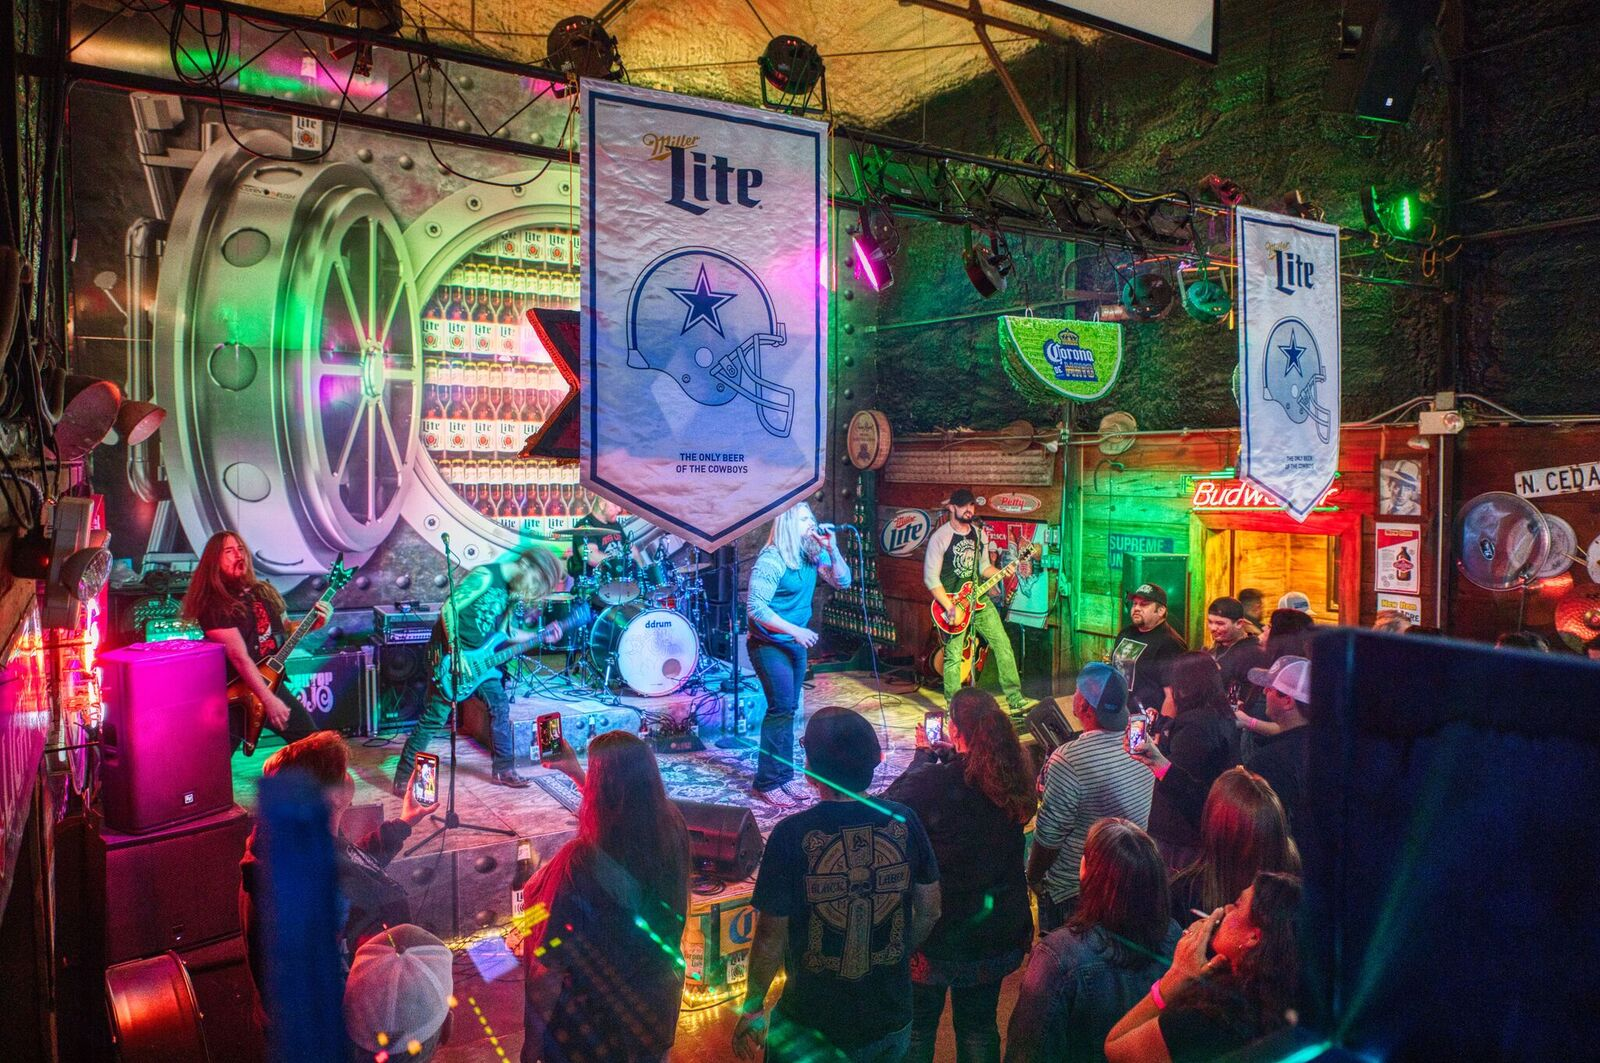 Black Top Mojo playing at The Shelton Gin Hall